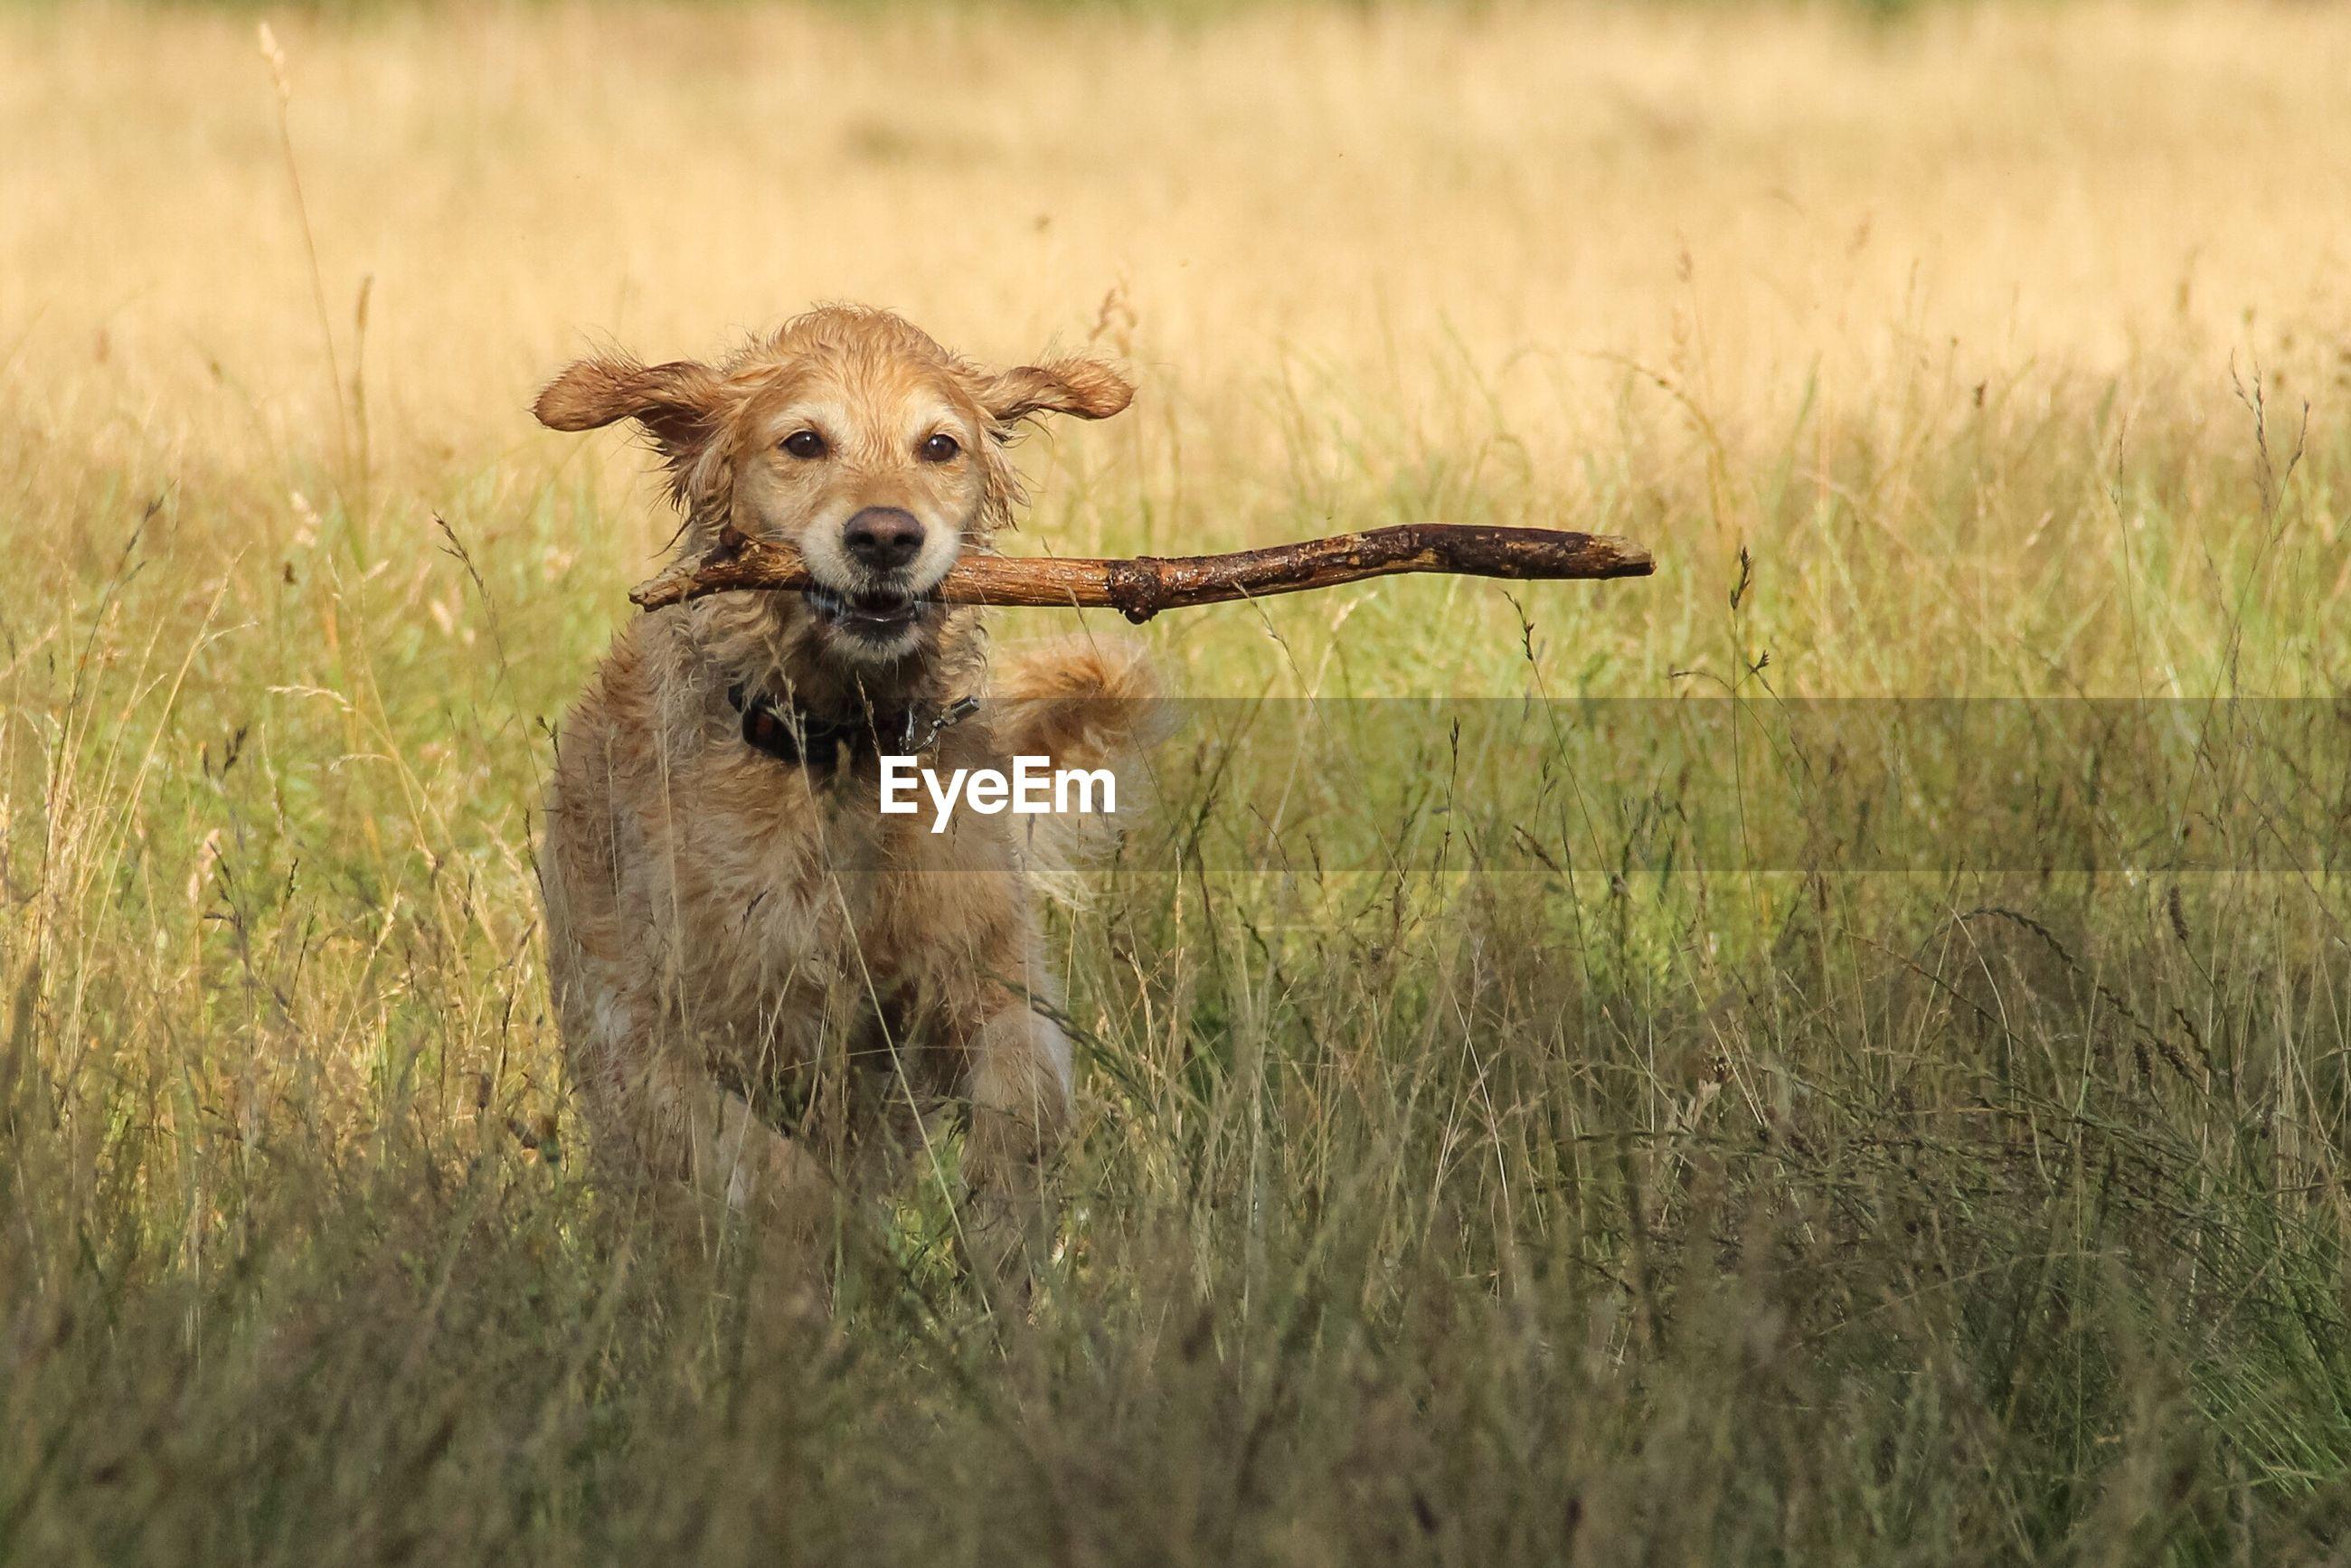 Portrait of golden retriever carrying stick on grassy field